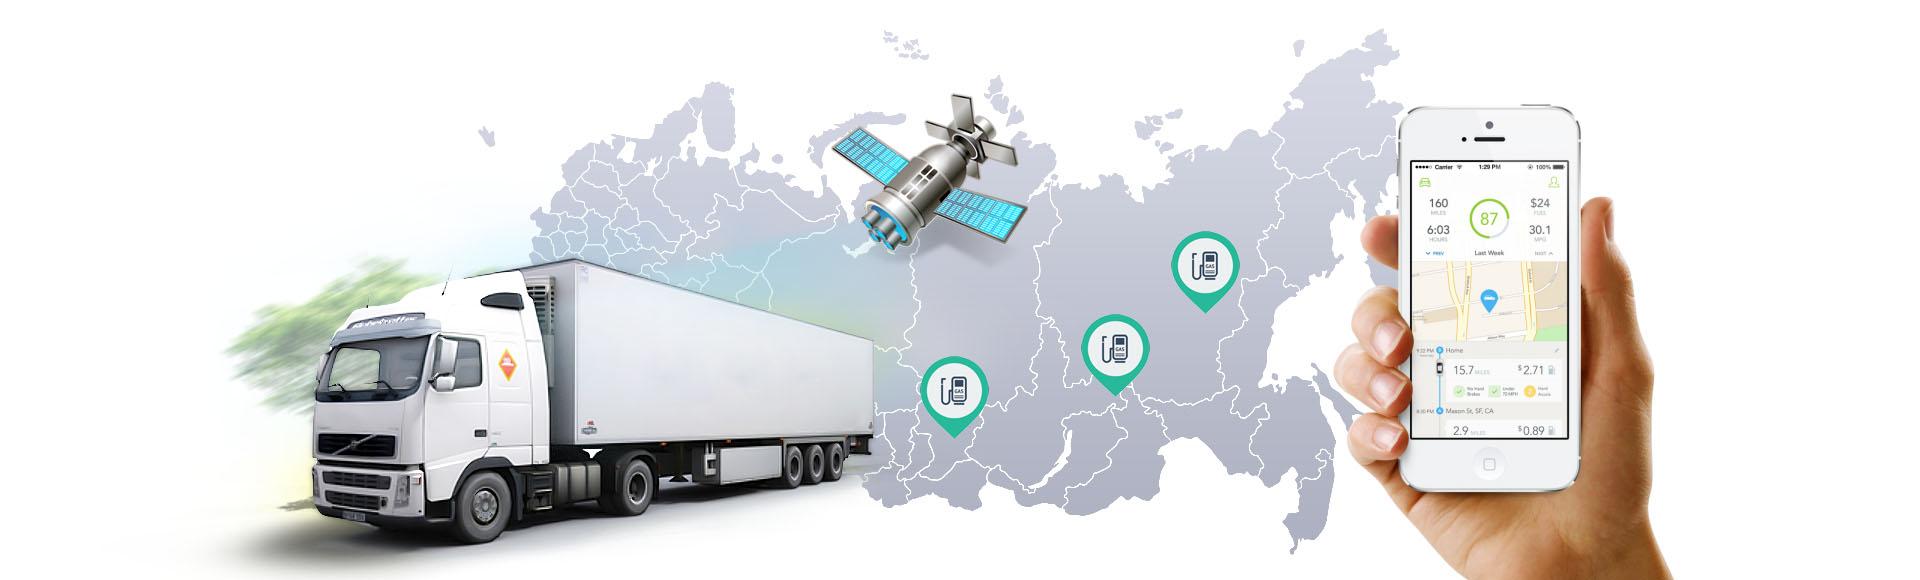 Мониторинг транспорта онлайн в Элисте